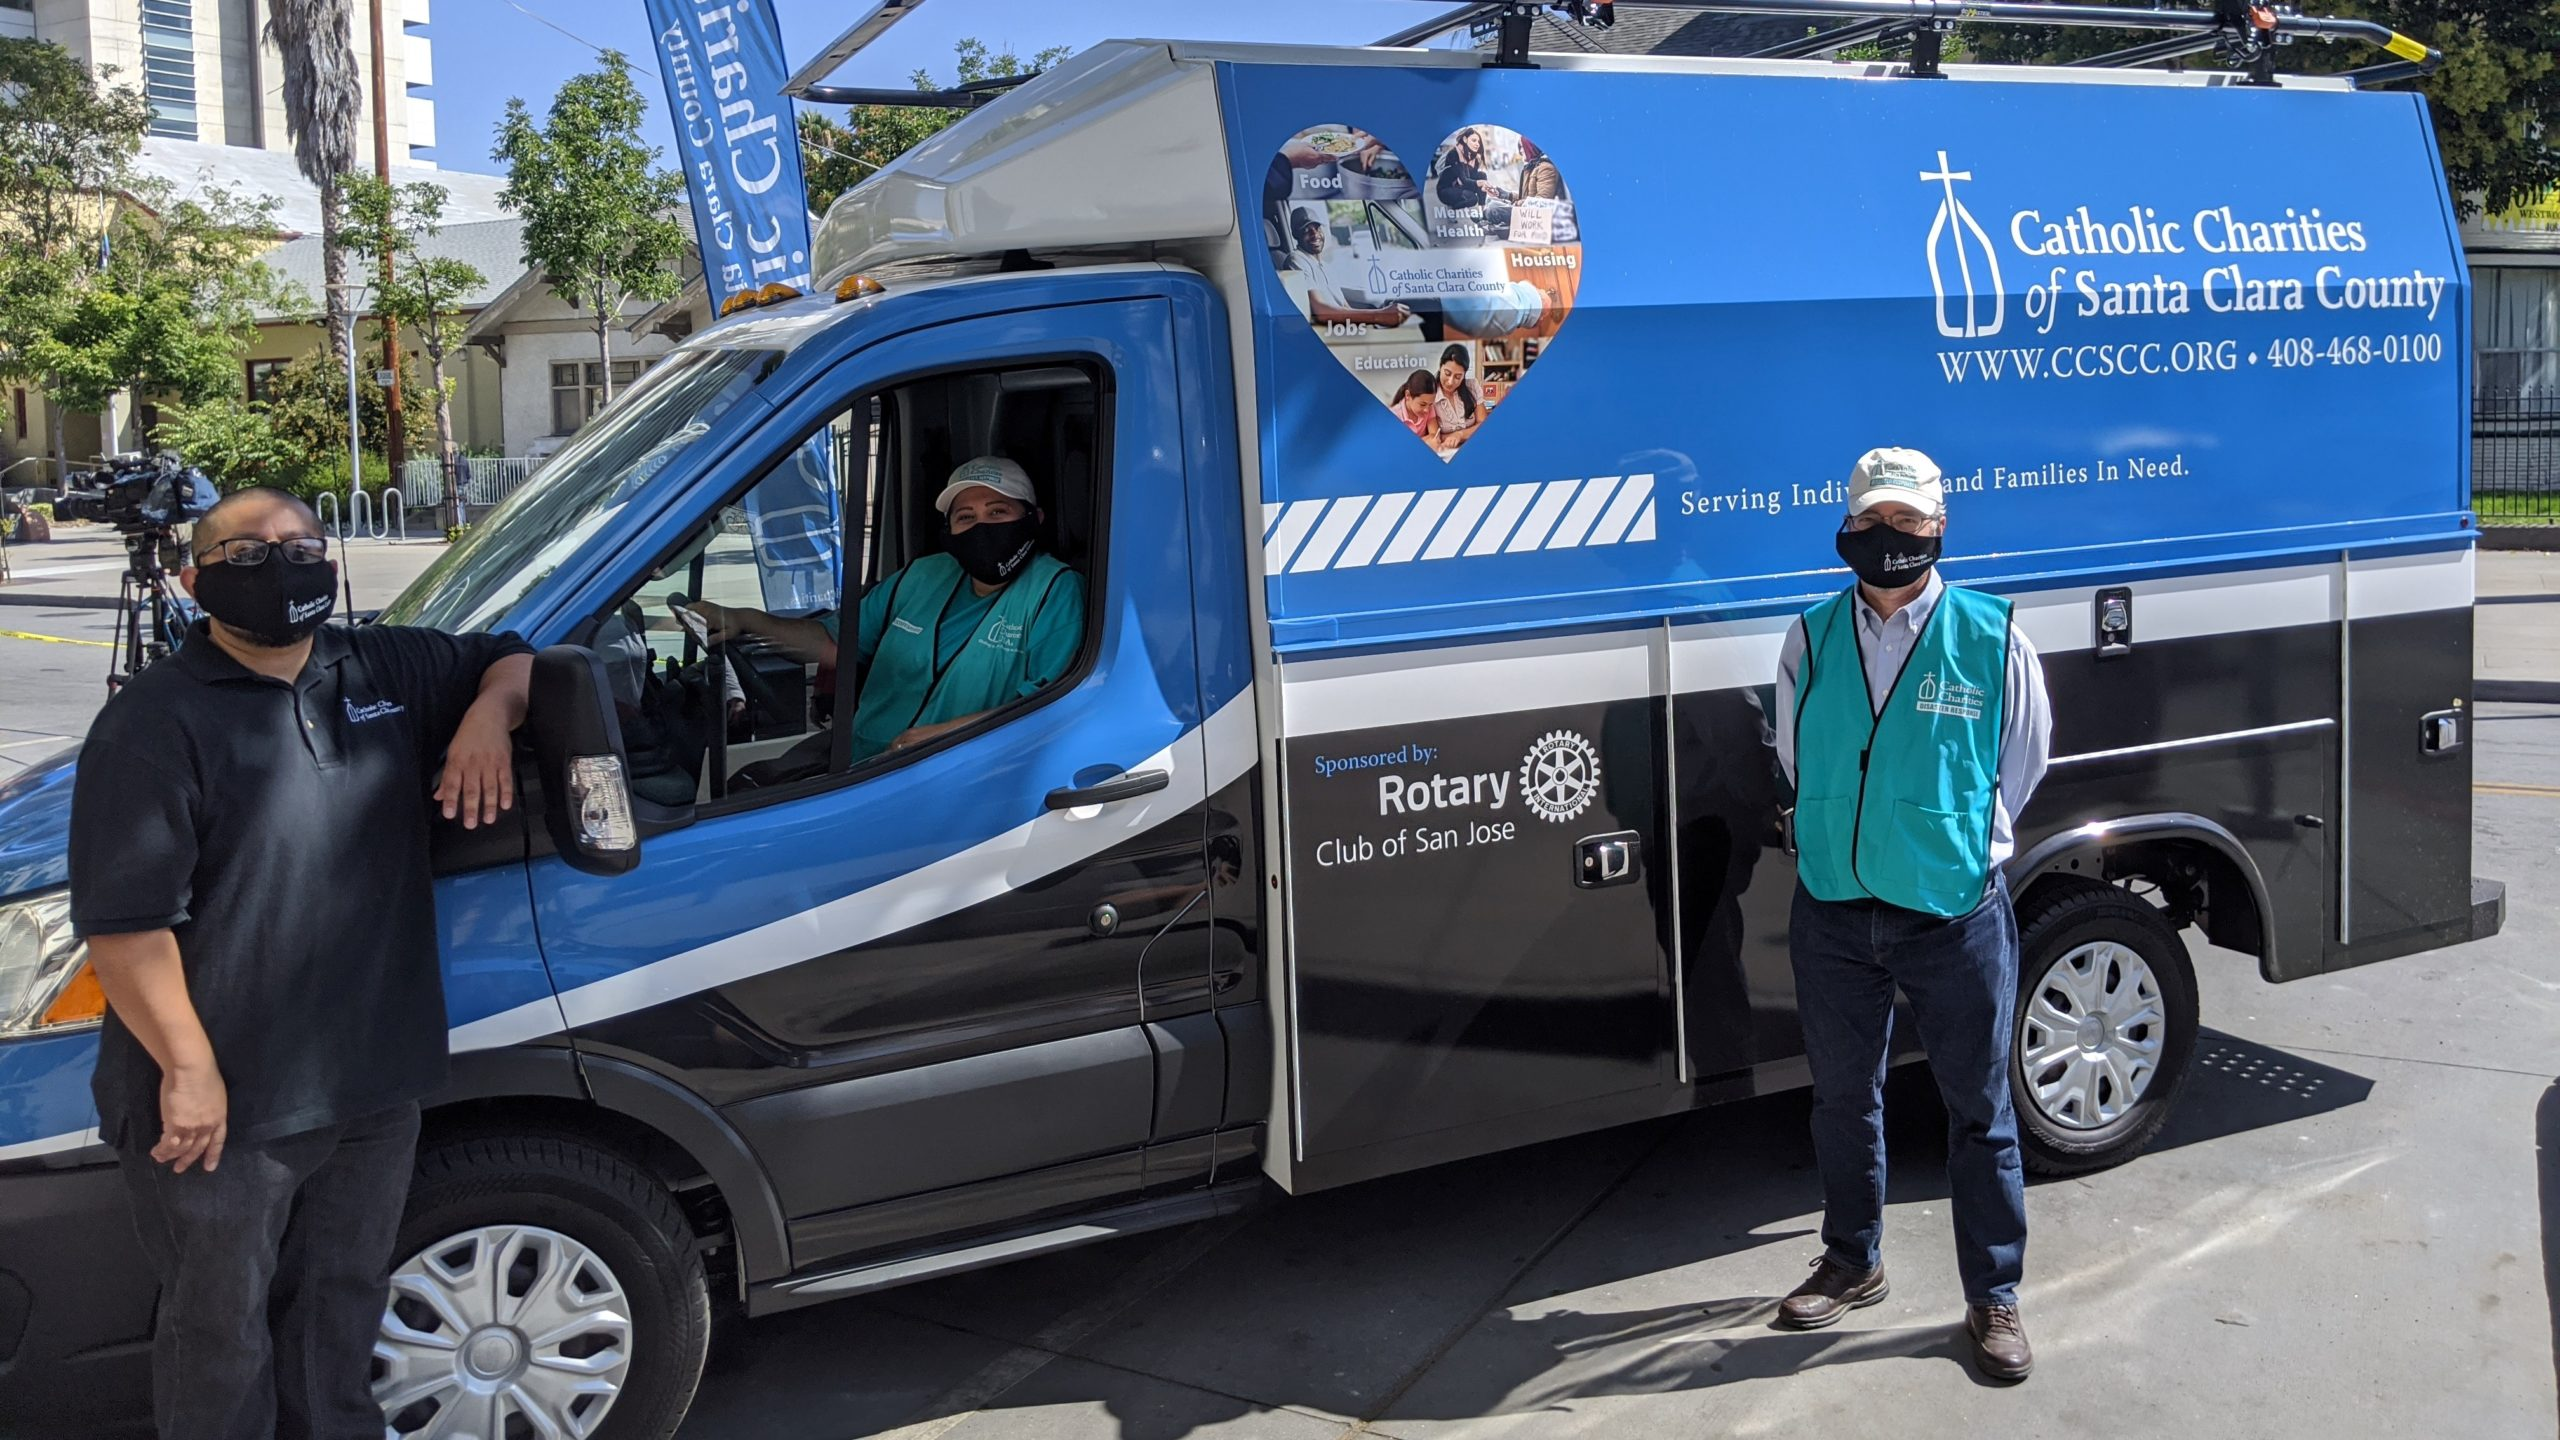 Volunteers in front of a Catholic Charities of Santa Clara County van